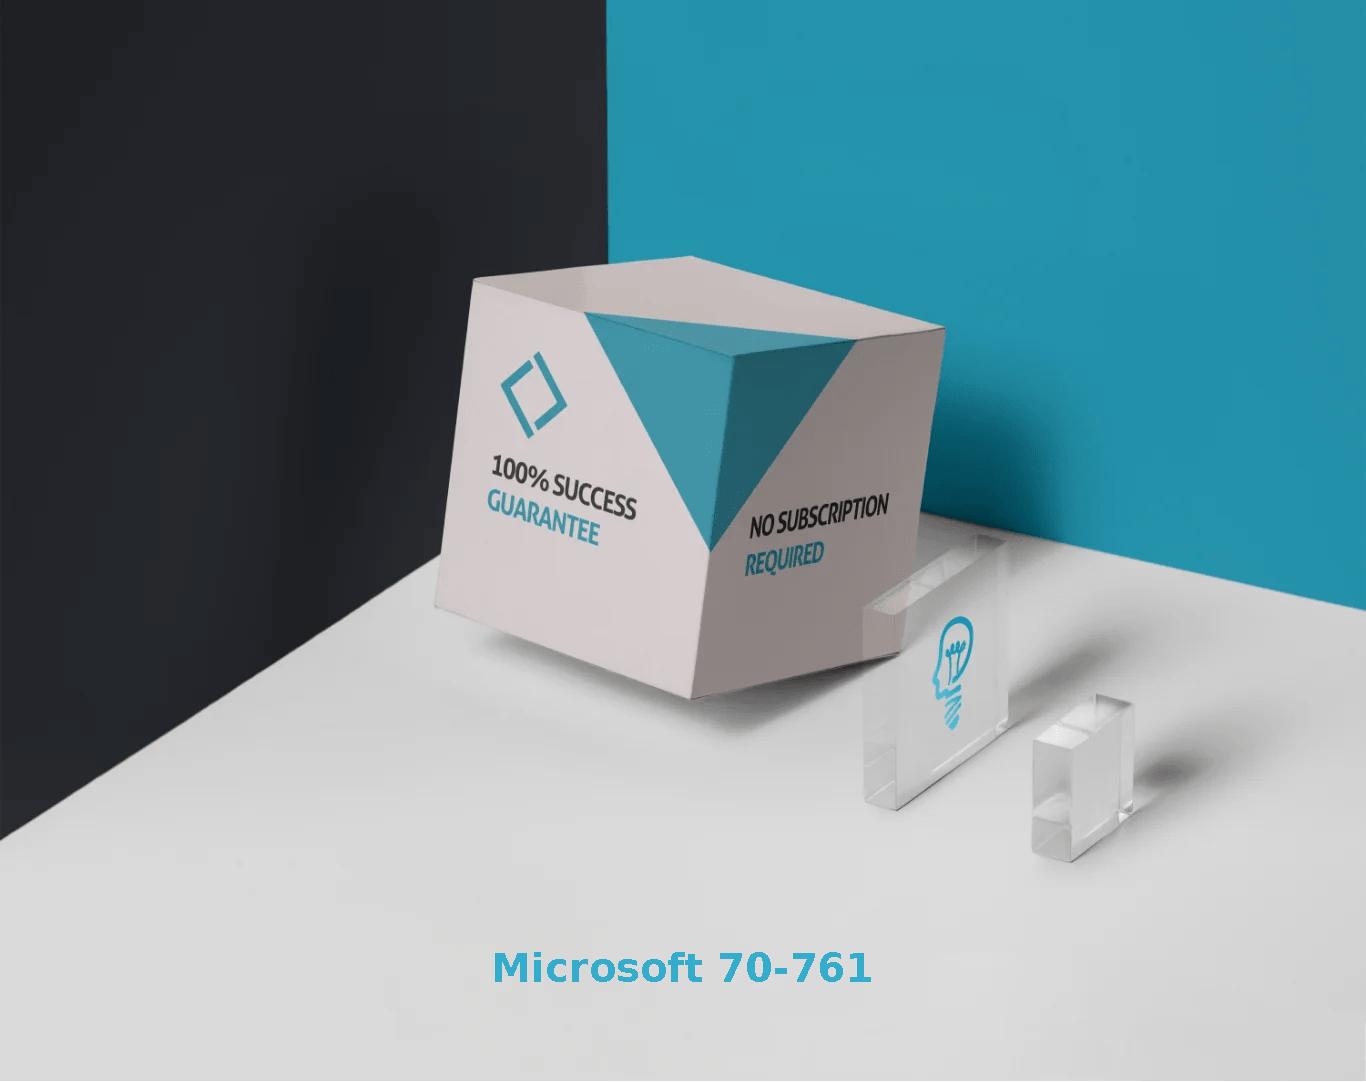 Microsoft 70-761 Exams